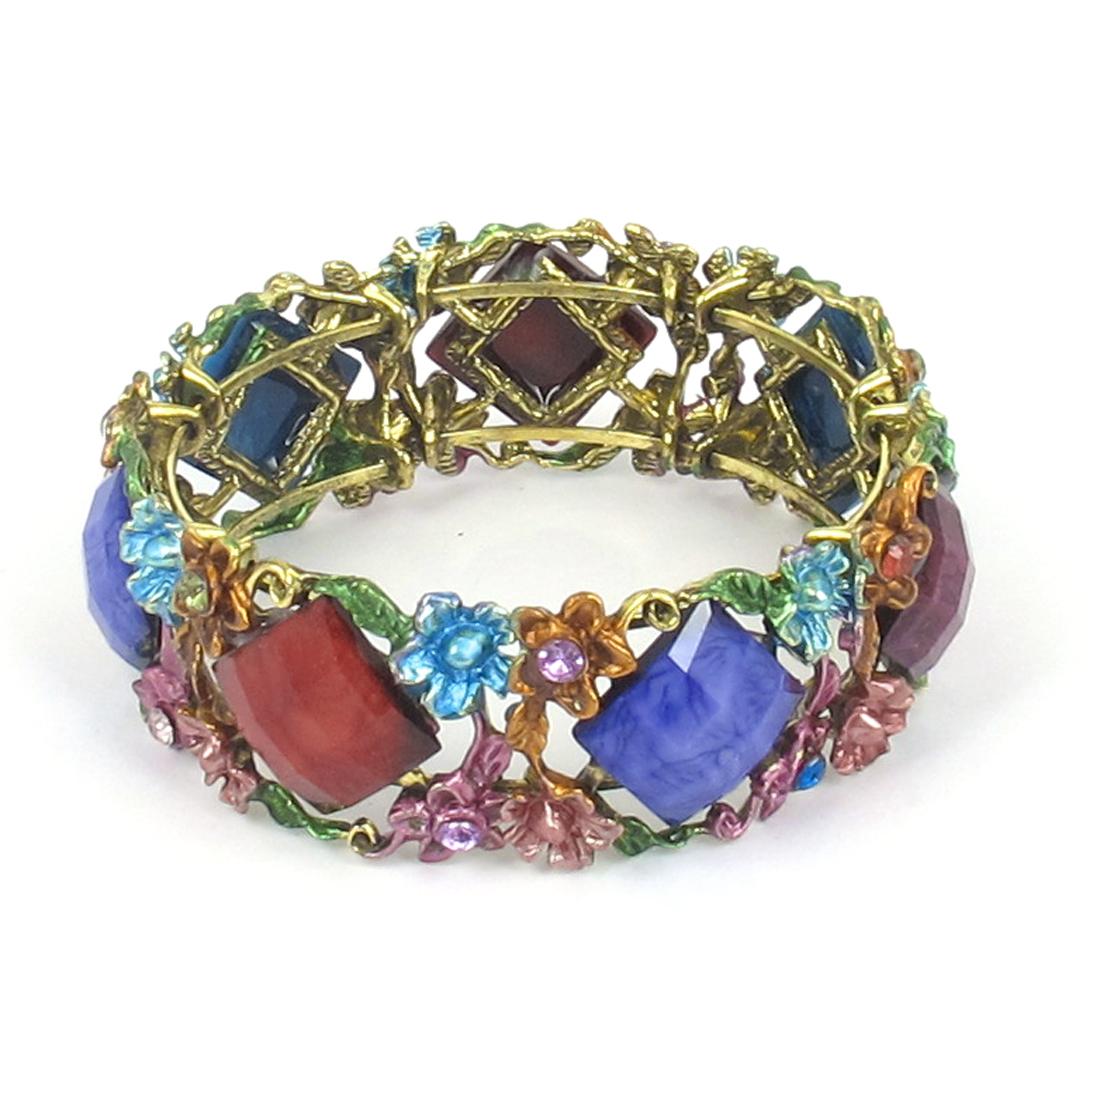 Lady Wedding Party Metal Flower Detailing Wrist Bracelet Bangle Ornament Multicolor